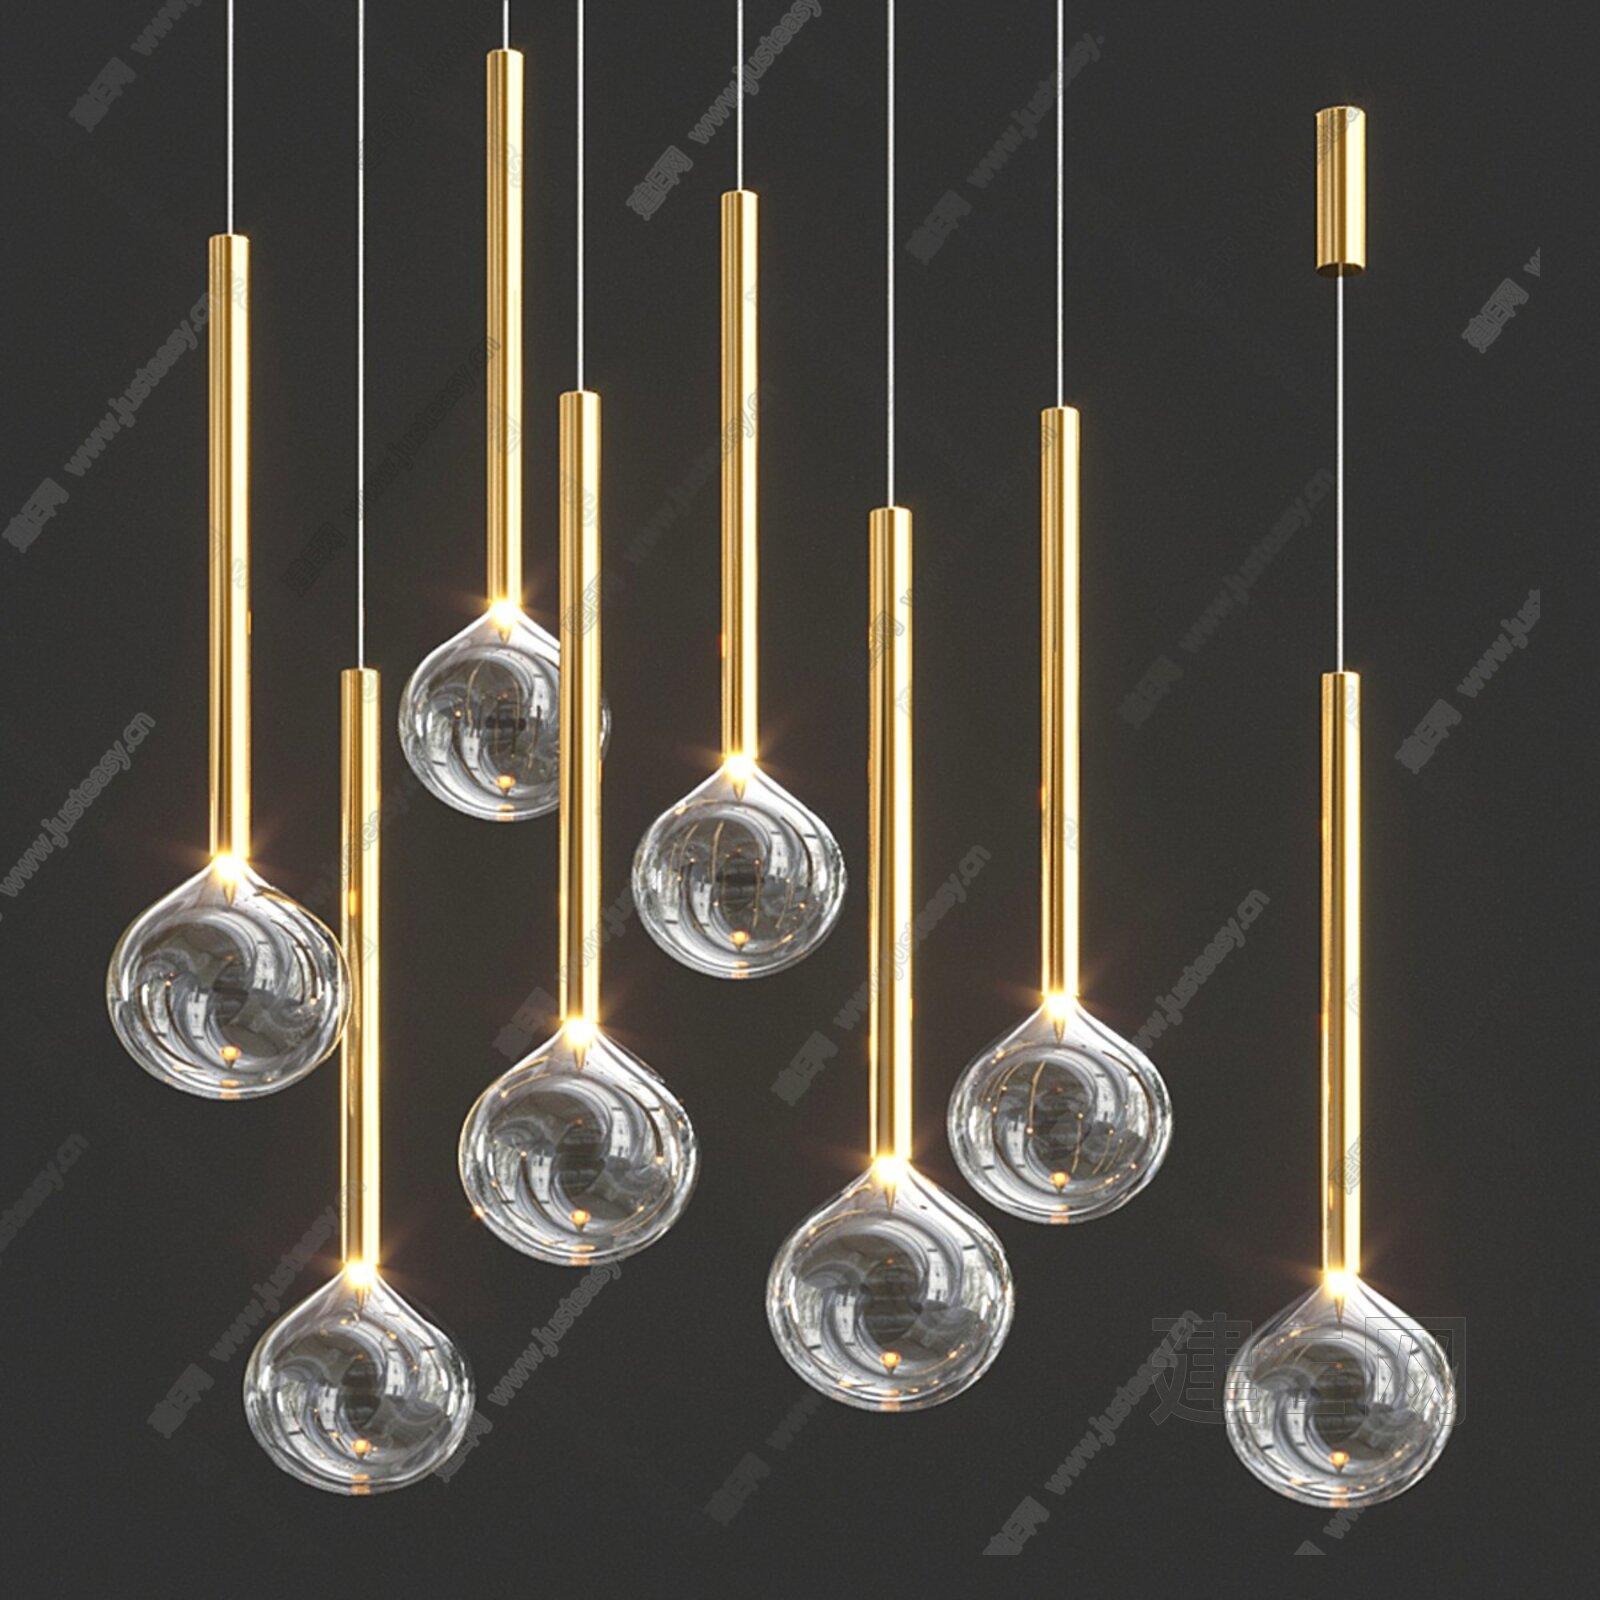 Bonaldo Sofi 现代金属玻璃吊灯3d模型